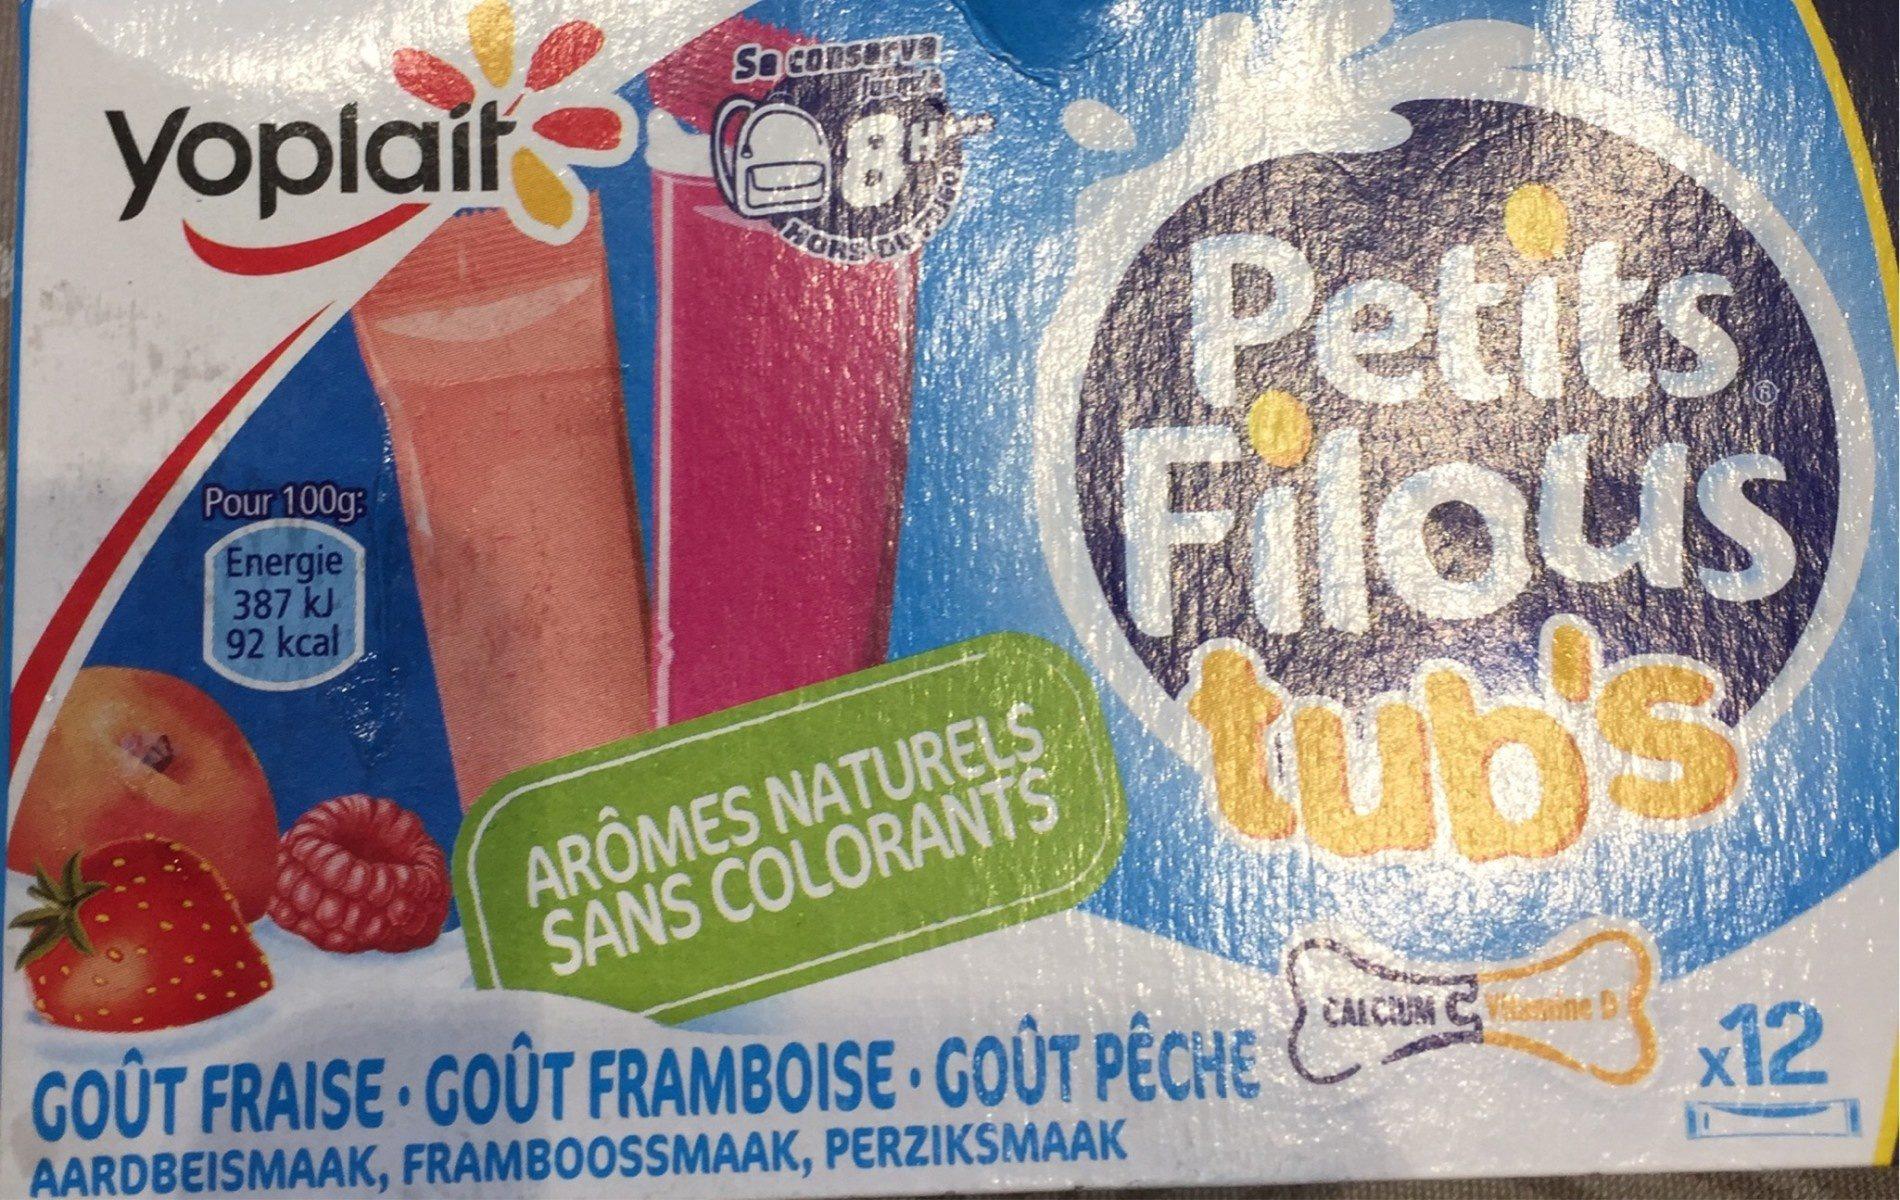 Petits Filous Tub's Goût Fraise, Pêche, Framboise - Product - fr